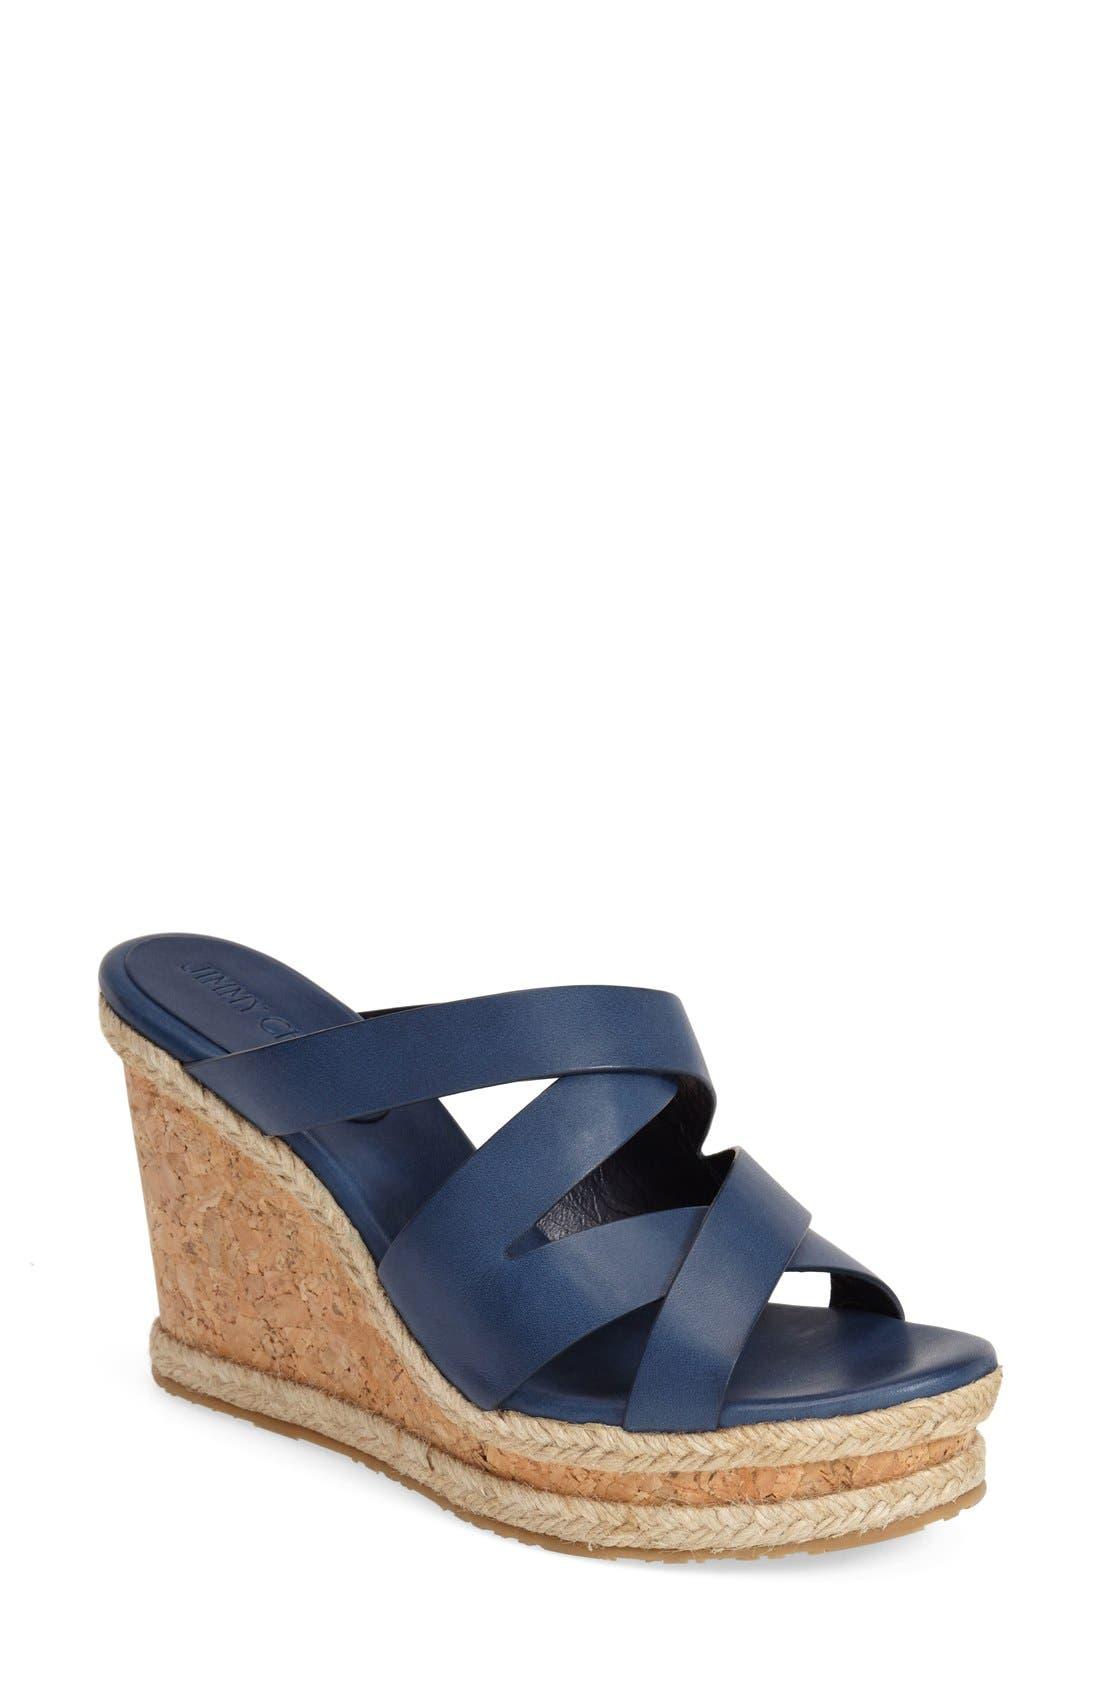 'Prisma' Leather Wedge Sandal,                         Main,                         color, 400